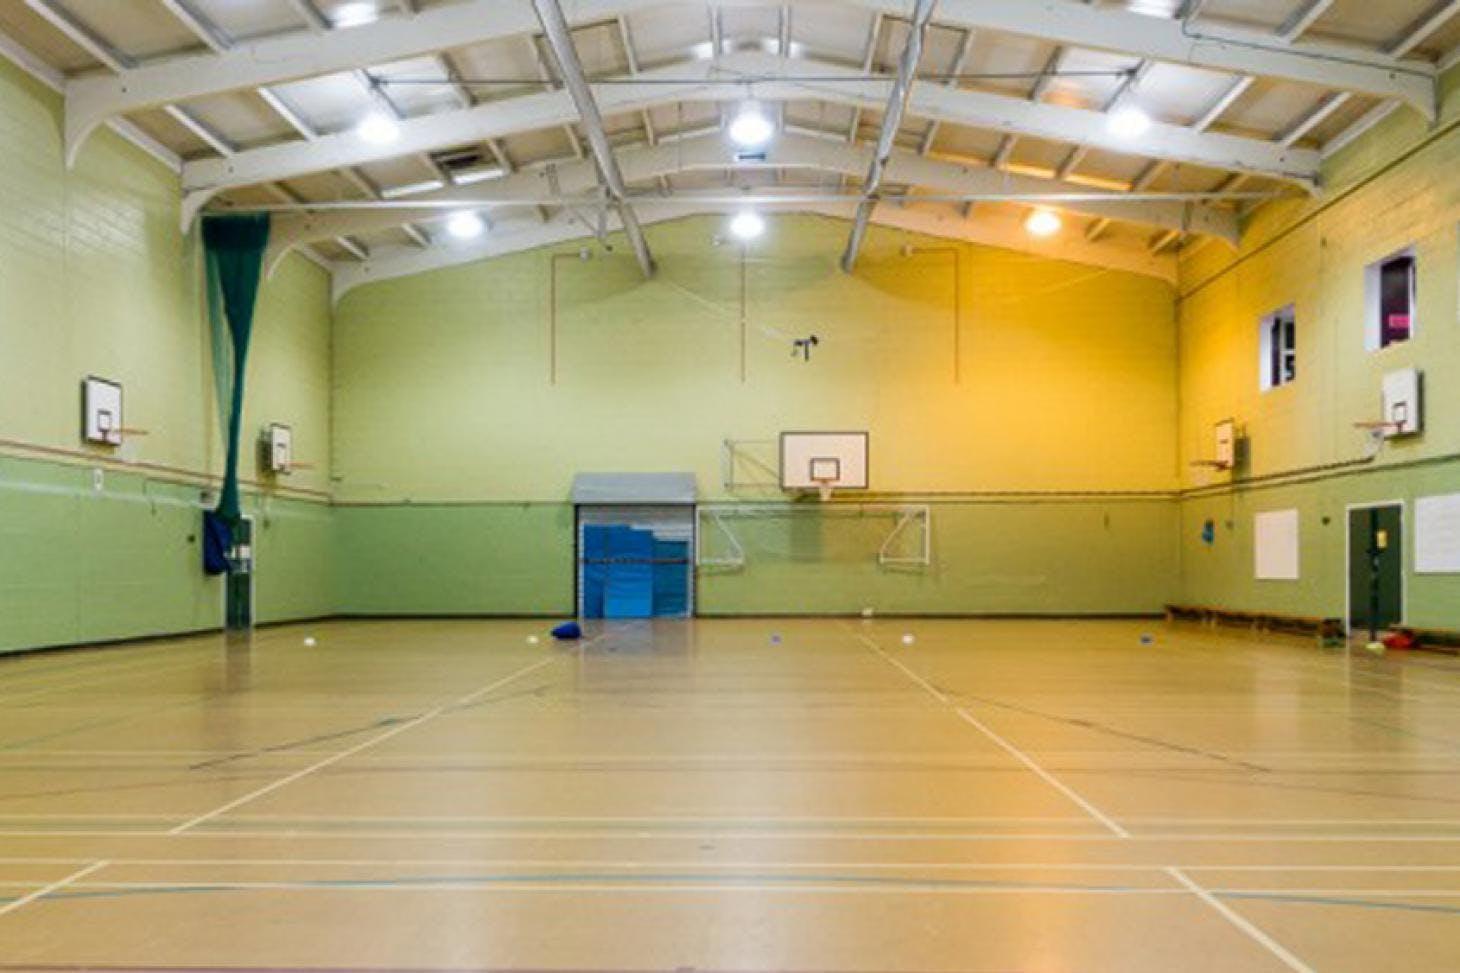 King Harold Business and Enterprise Academy Indoor | Hard badminton court